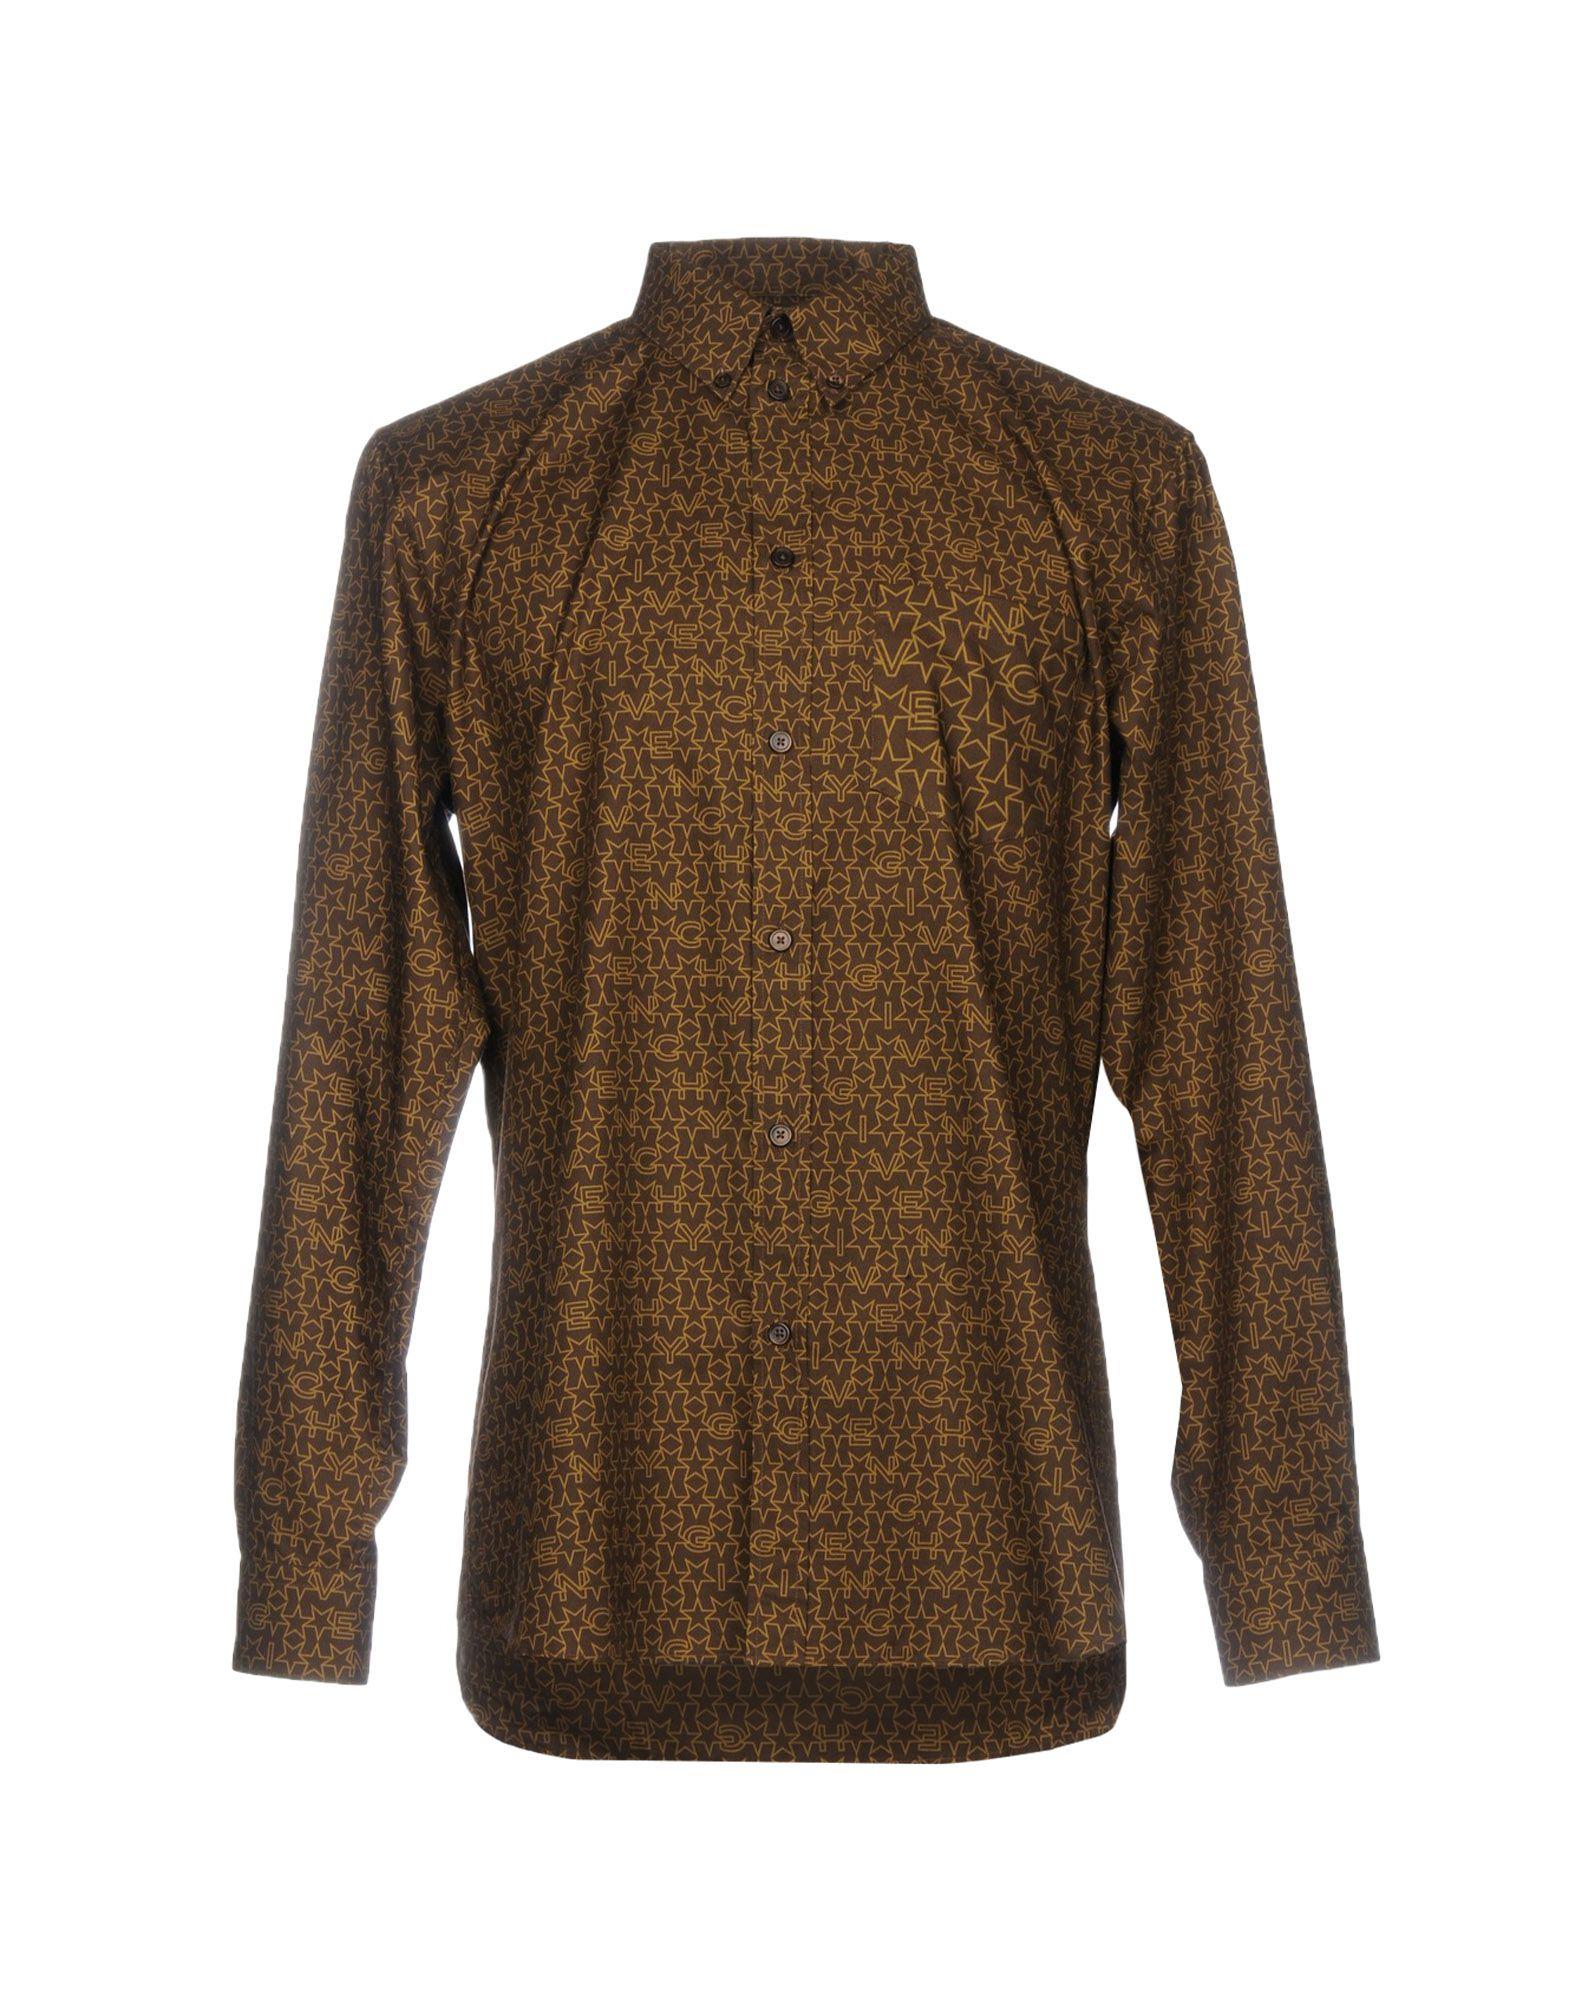 Camicia Fantasia Givenchy Uomo - Acquista online su